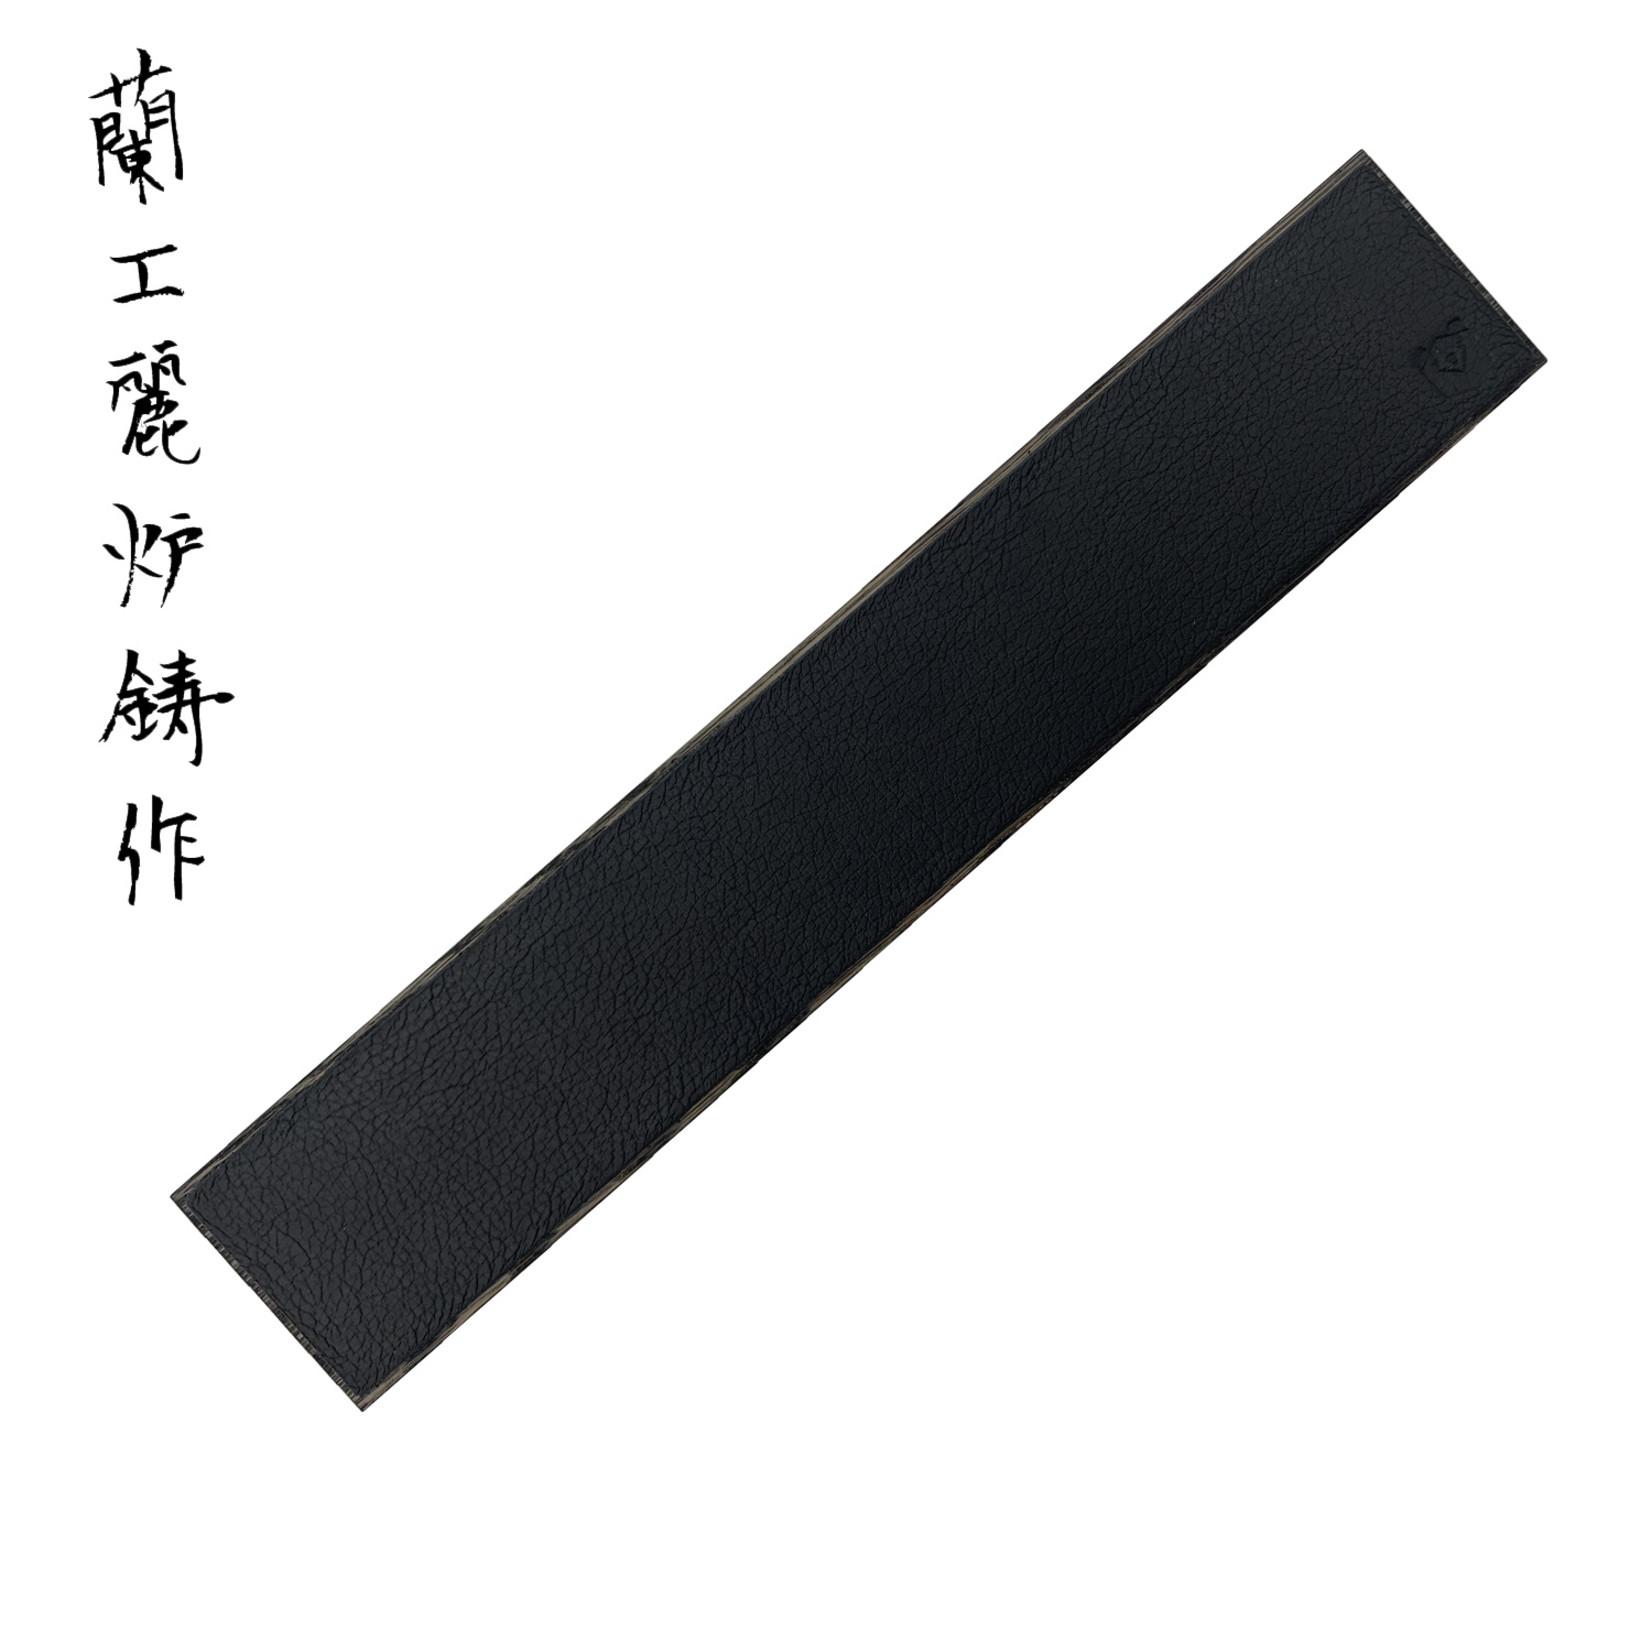 PIOTR THE BEAR knifemagnet leather 400 mm black